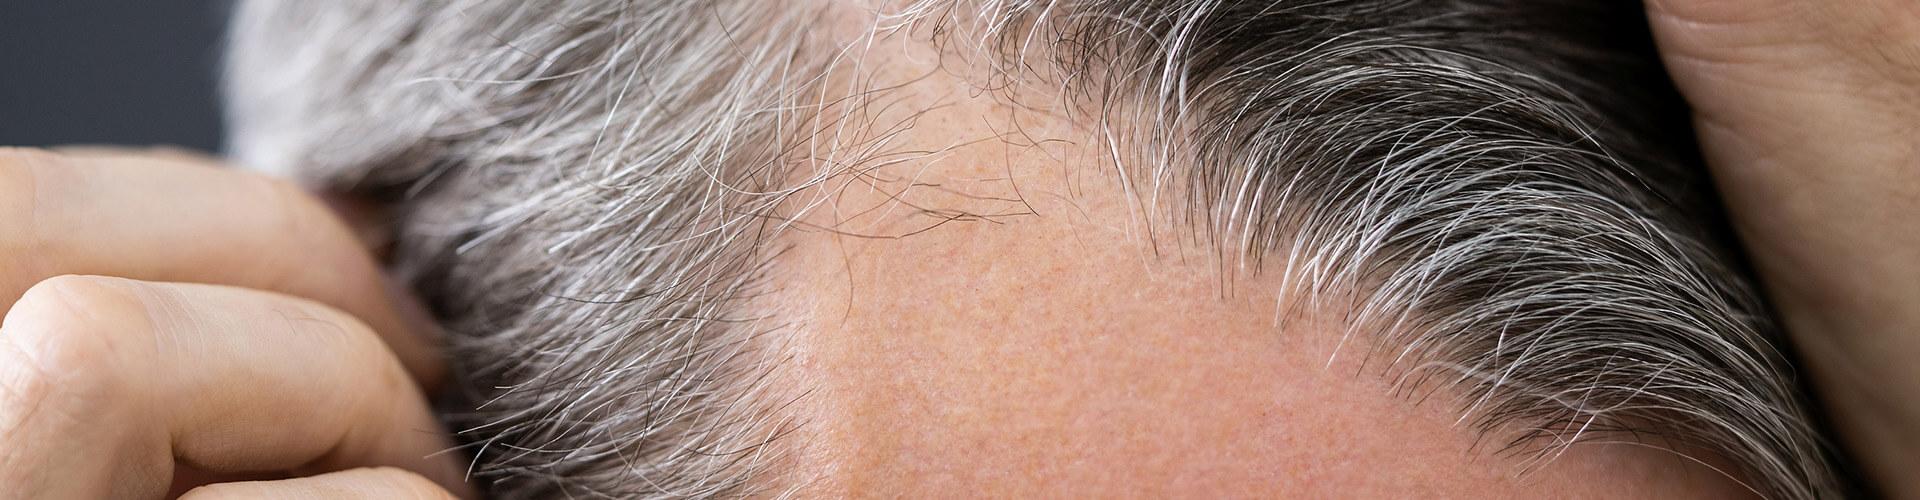 Hair Loss/Alopecia Alpharetta, GA